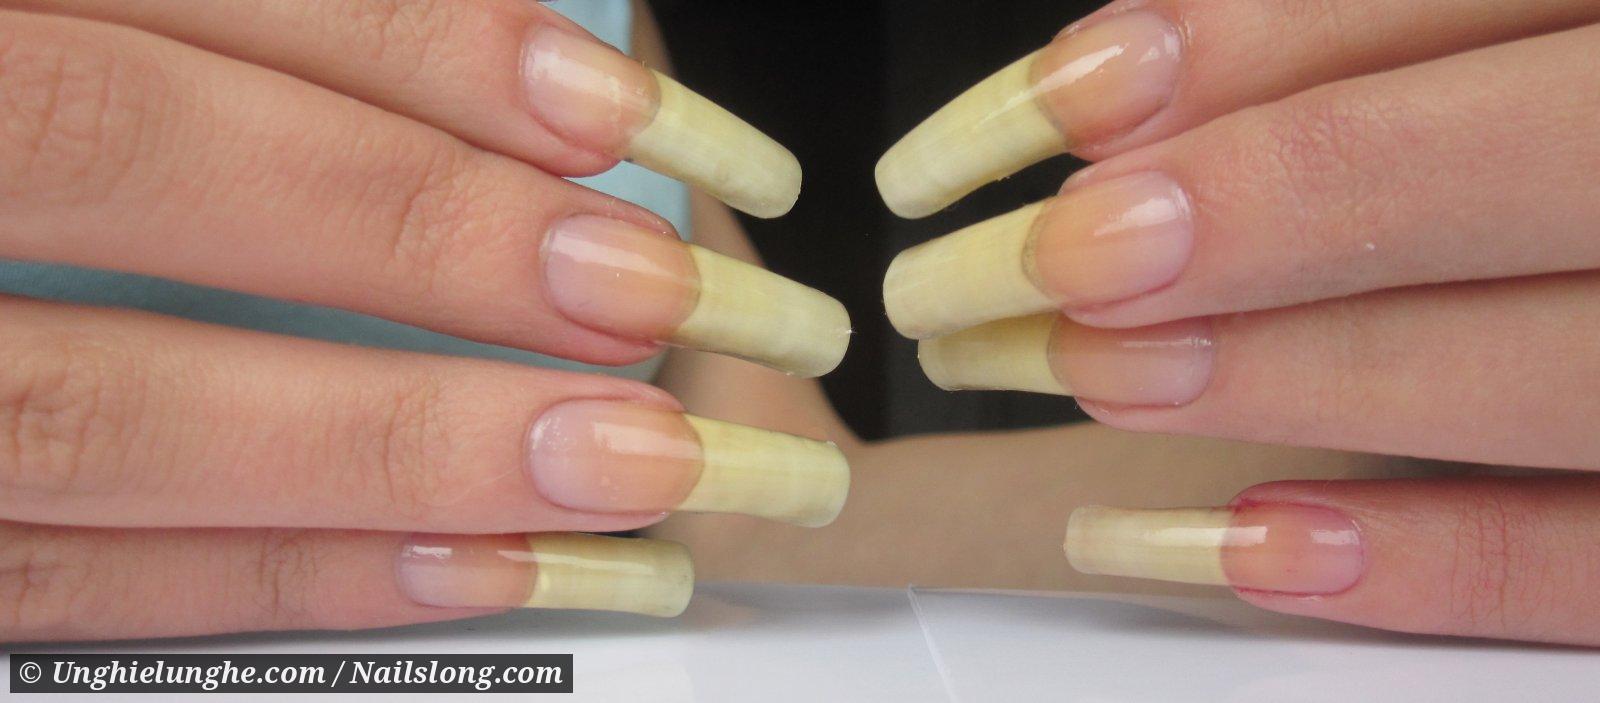 Форма ногтей лопатка фото